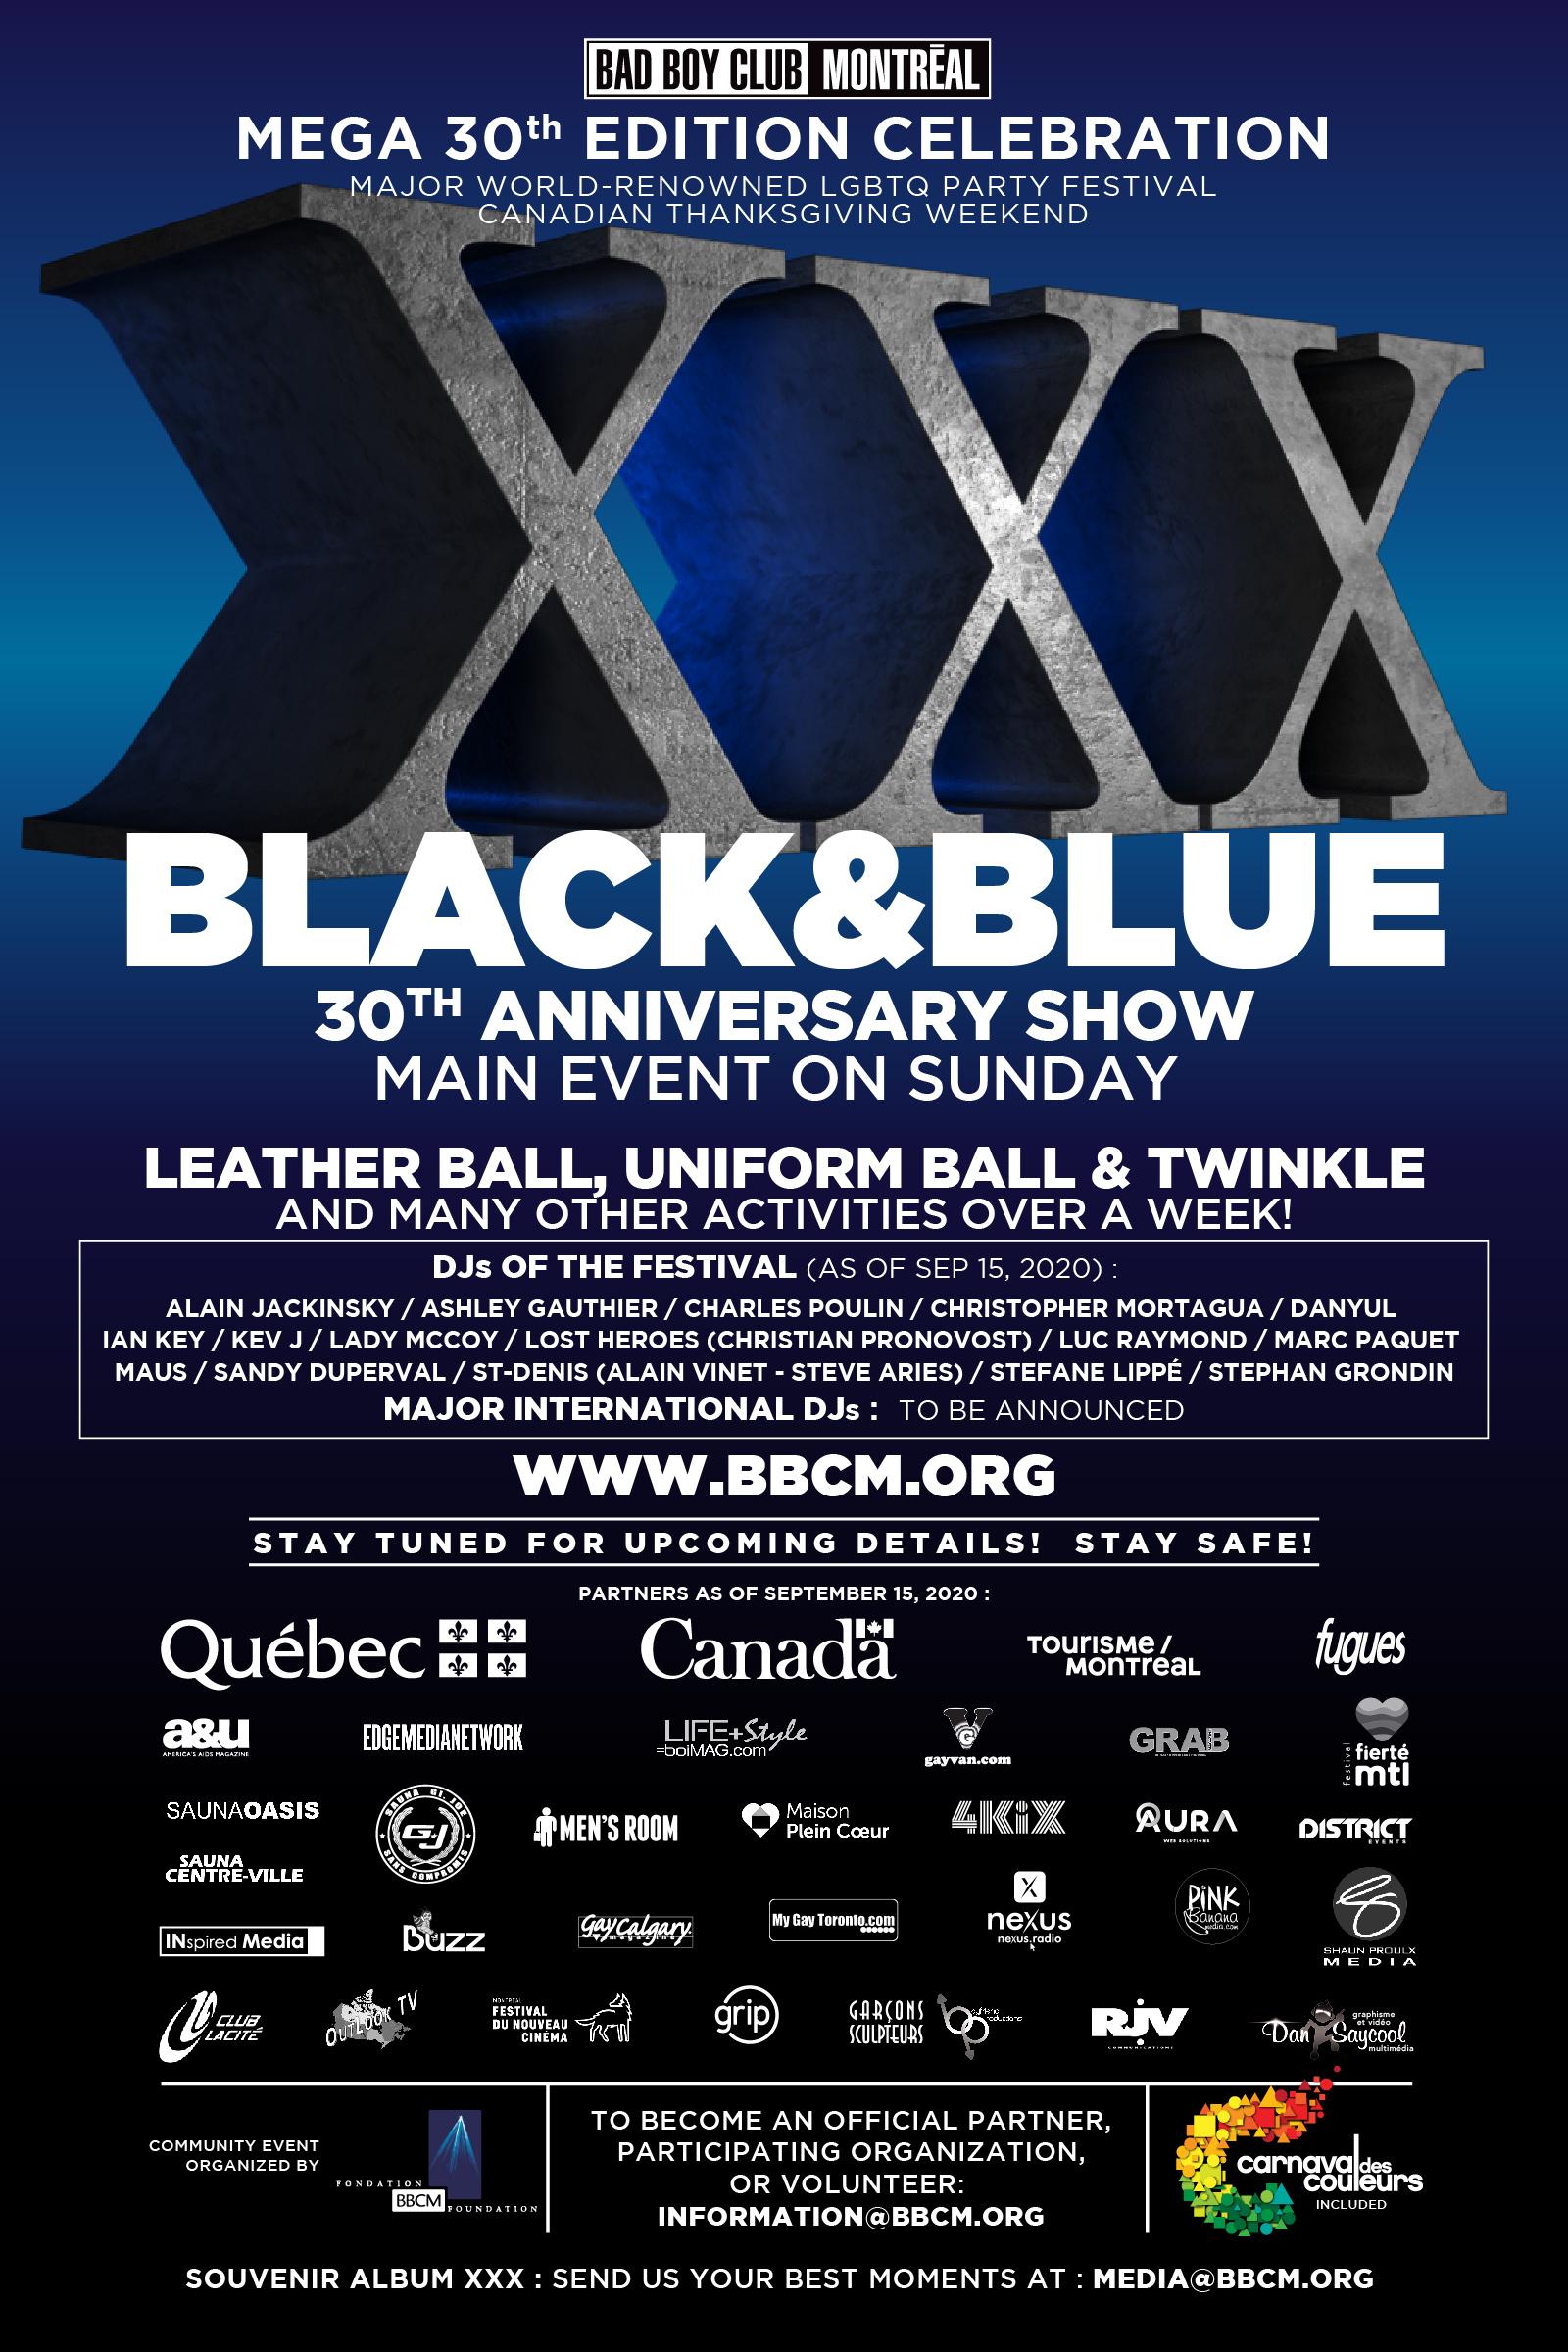 Black & Blue 2020